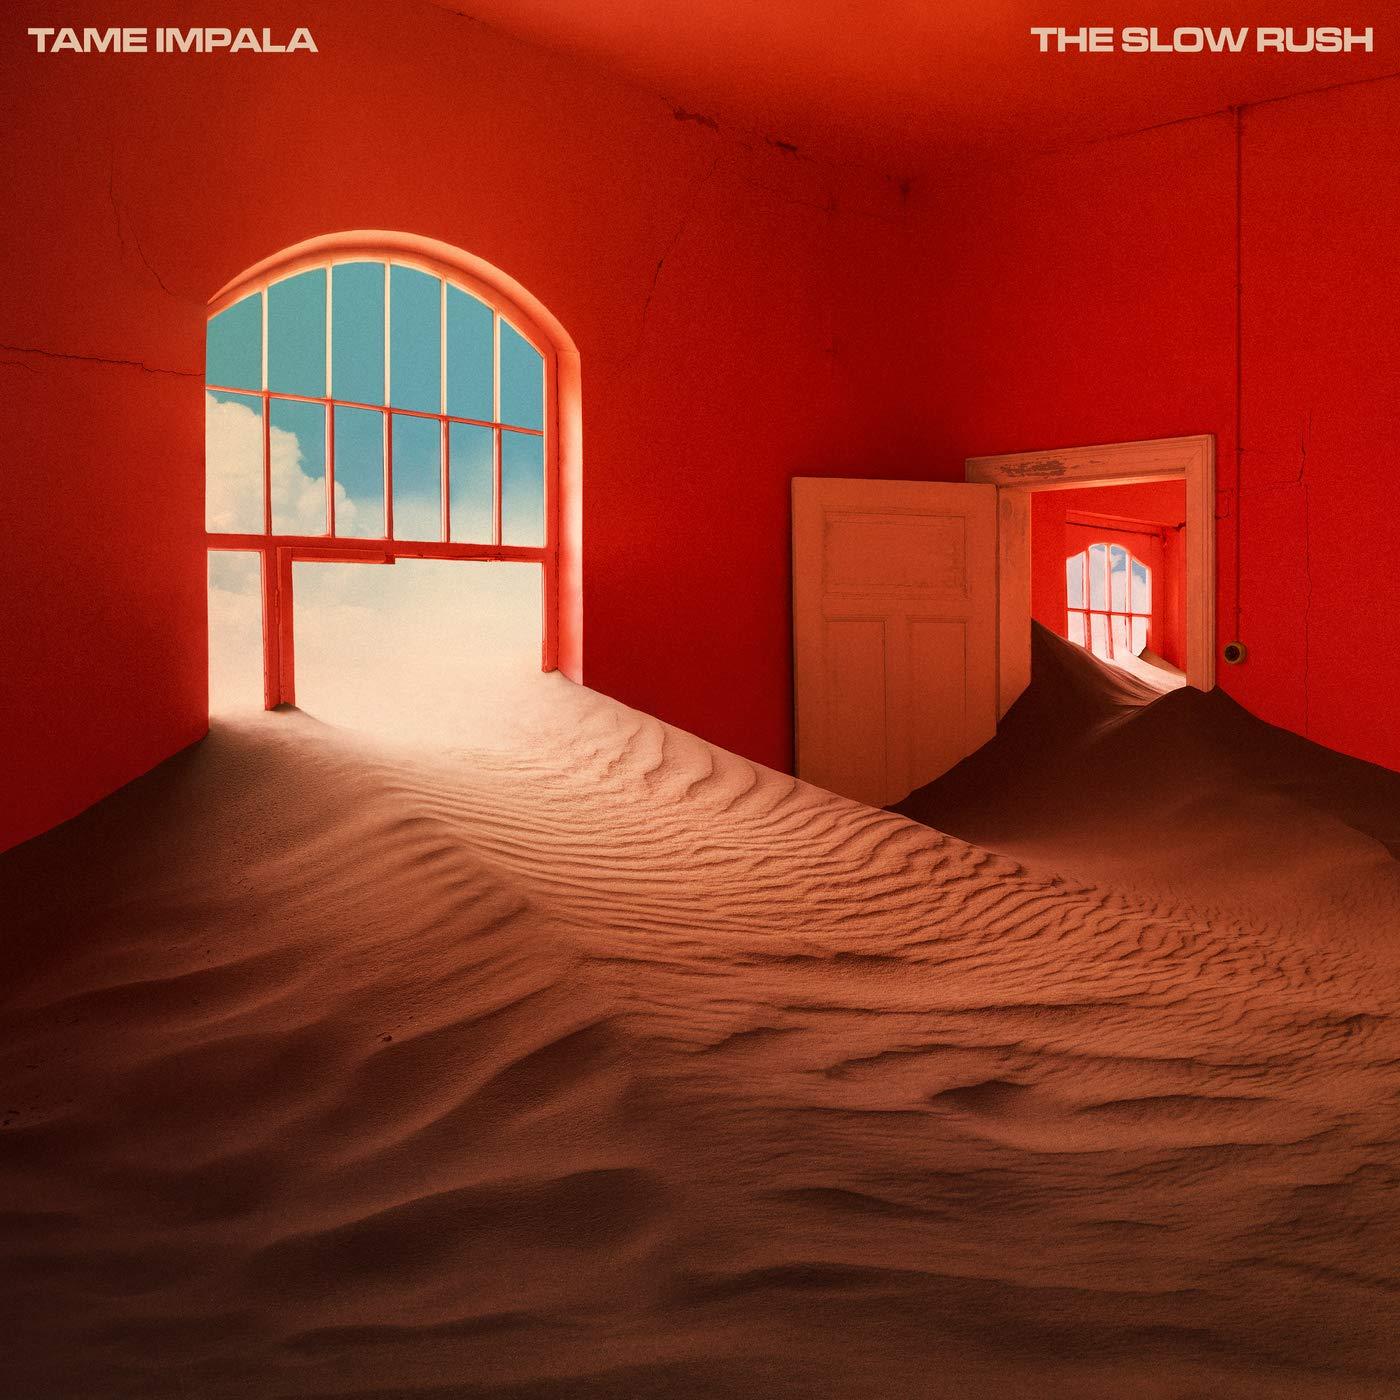 The Slow Rush: Tame Impala, Tame Impala: Amazon.es: Música